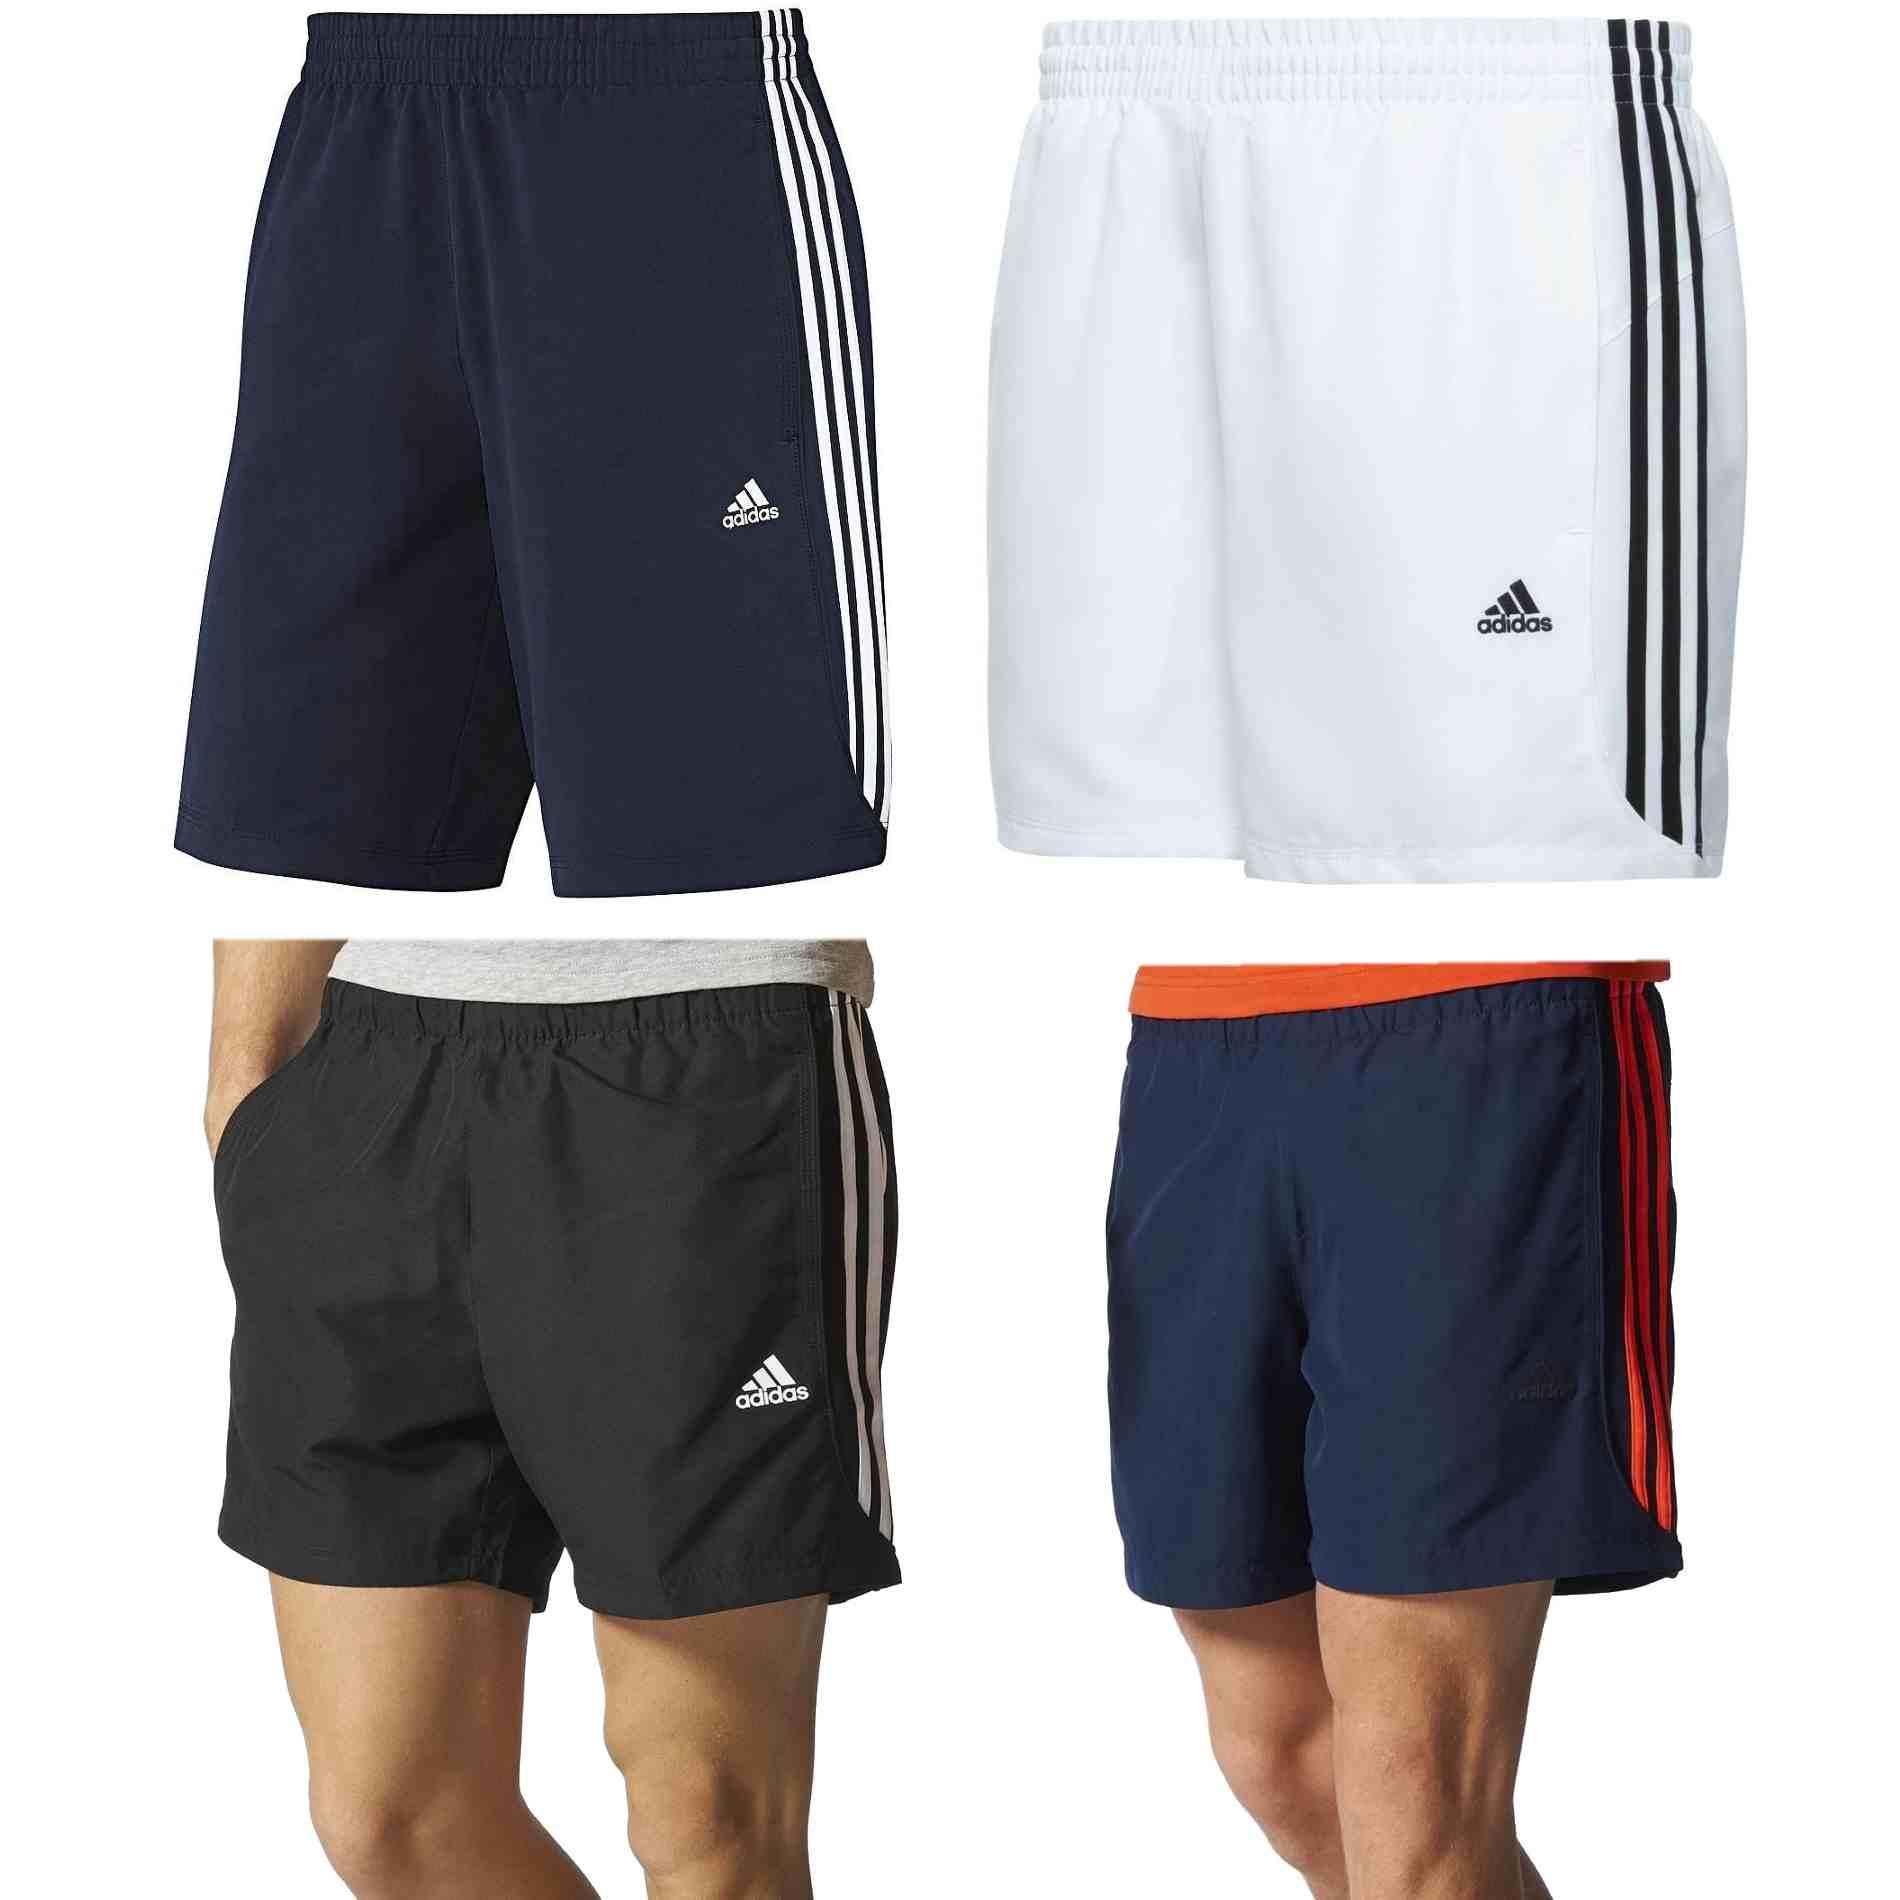 adidas shorts essentials climalite